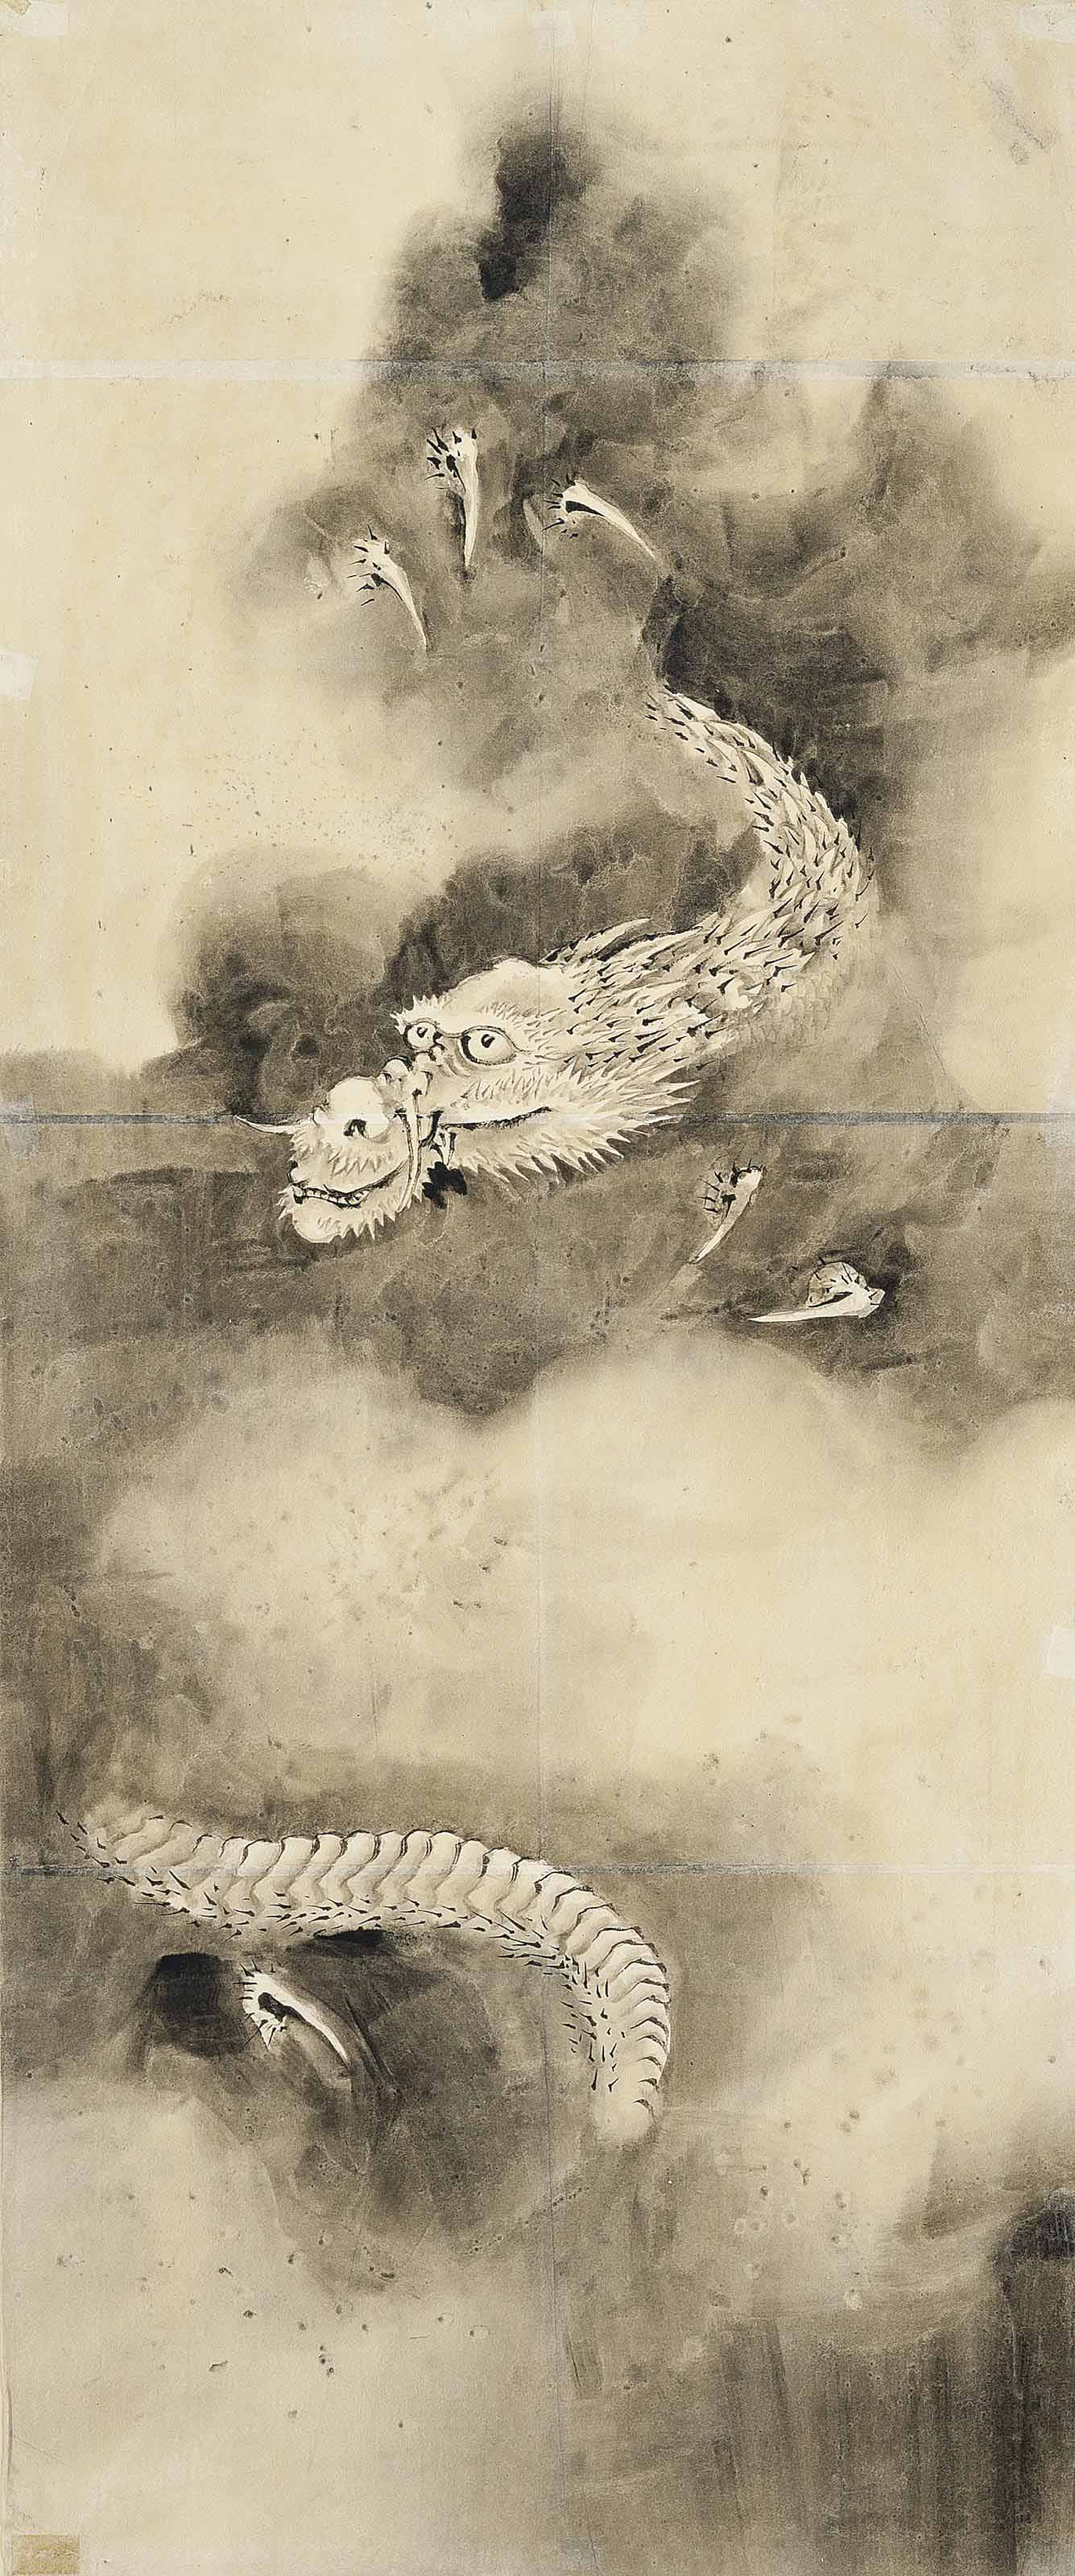 Attributed to Katsushika Hokusai (1760-1849)